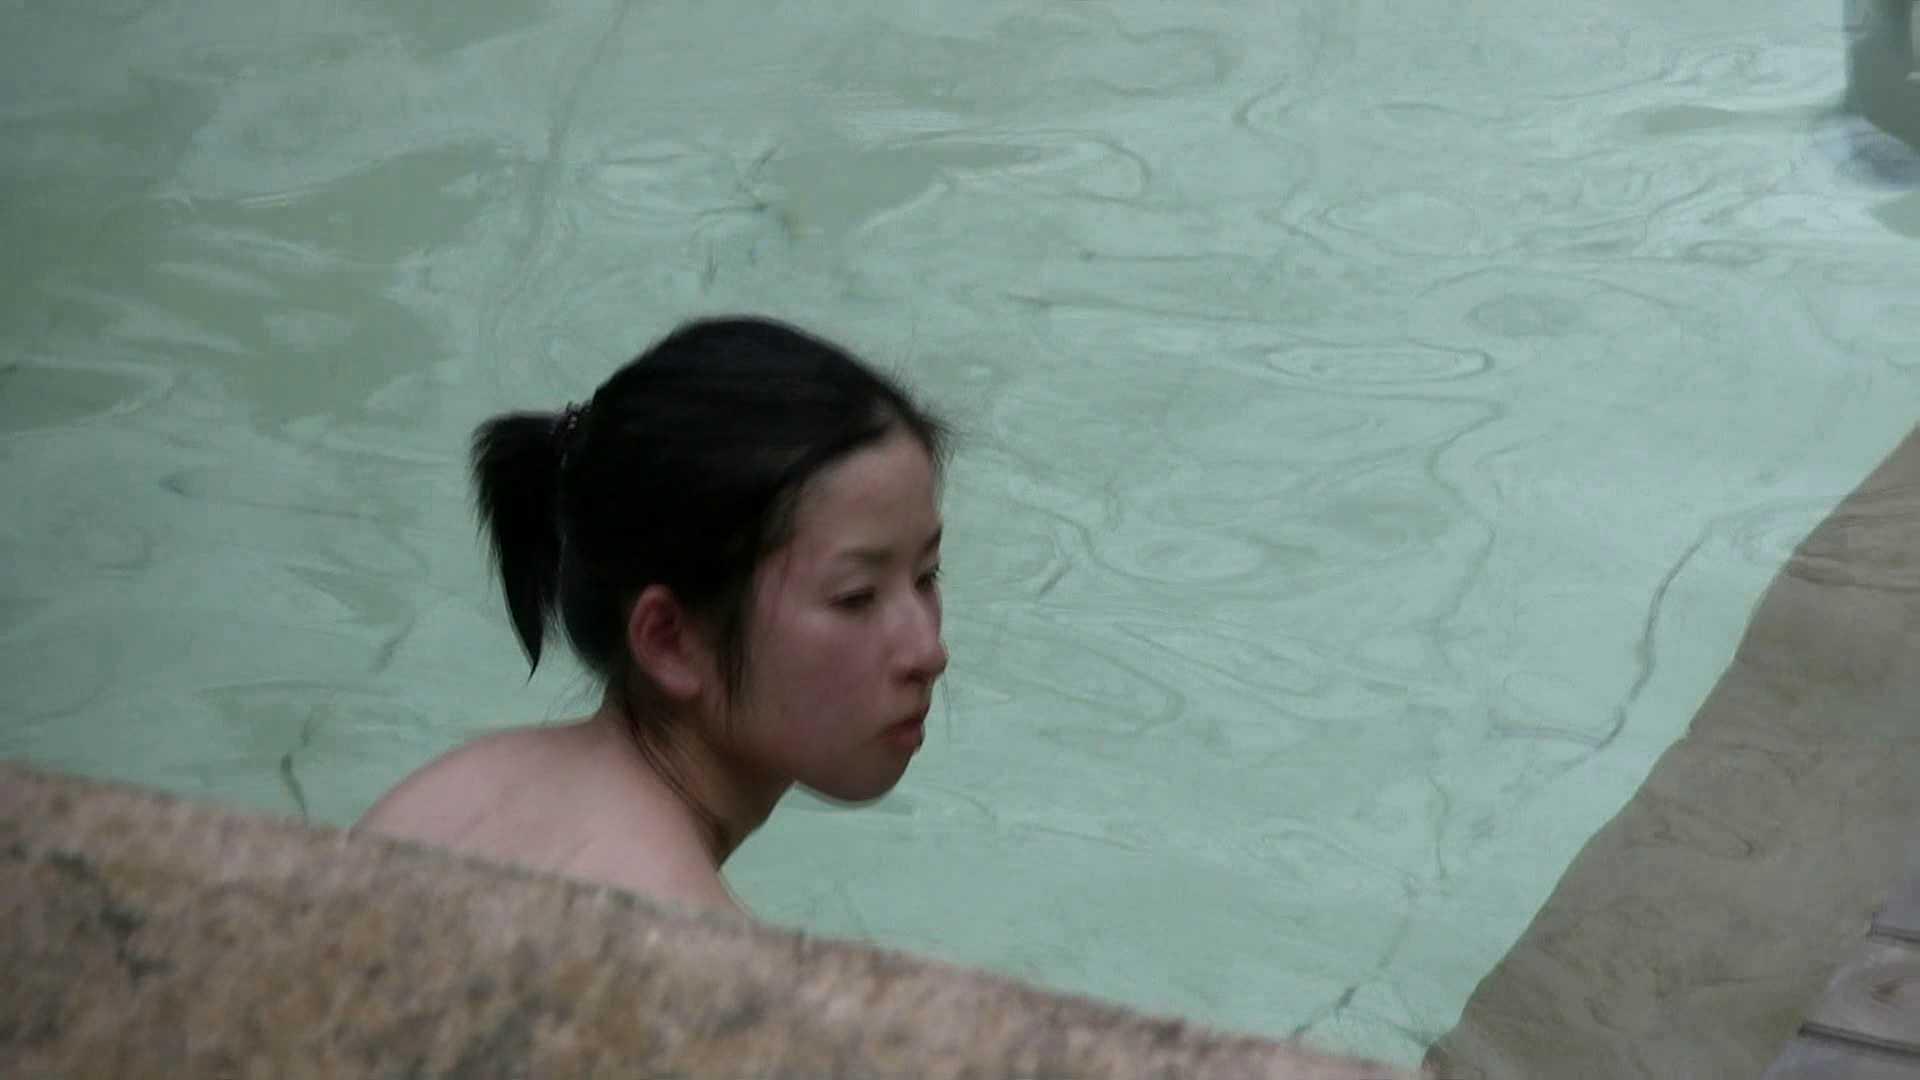 Aquaな露天風呂Vol.656 露天風呂編  91PIX 44